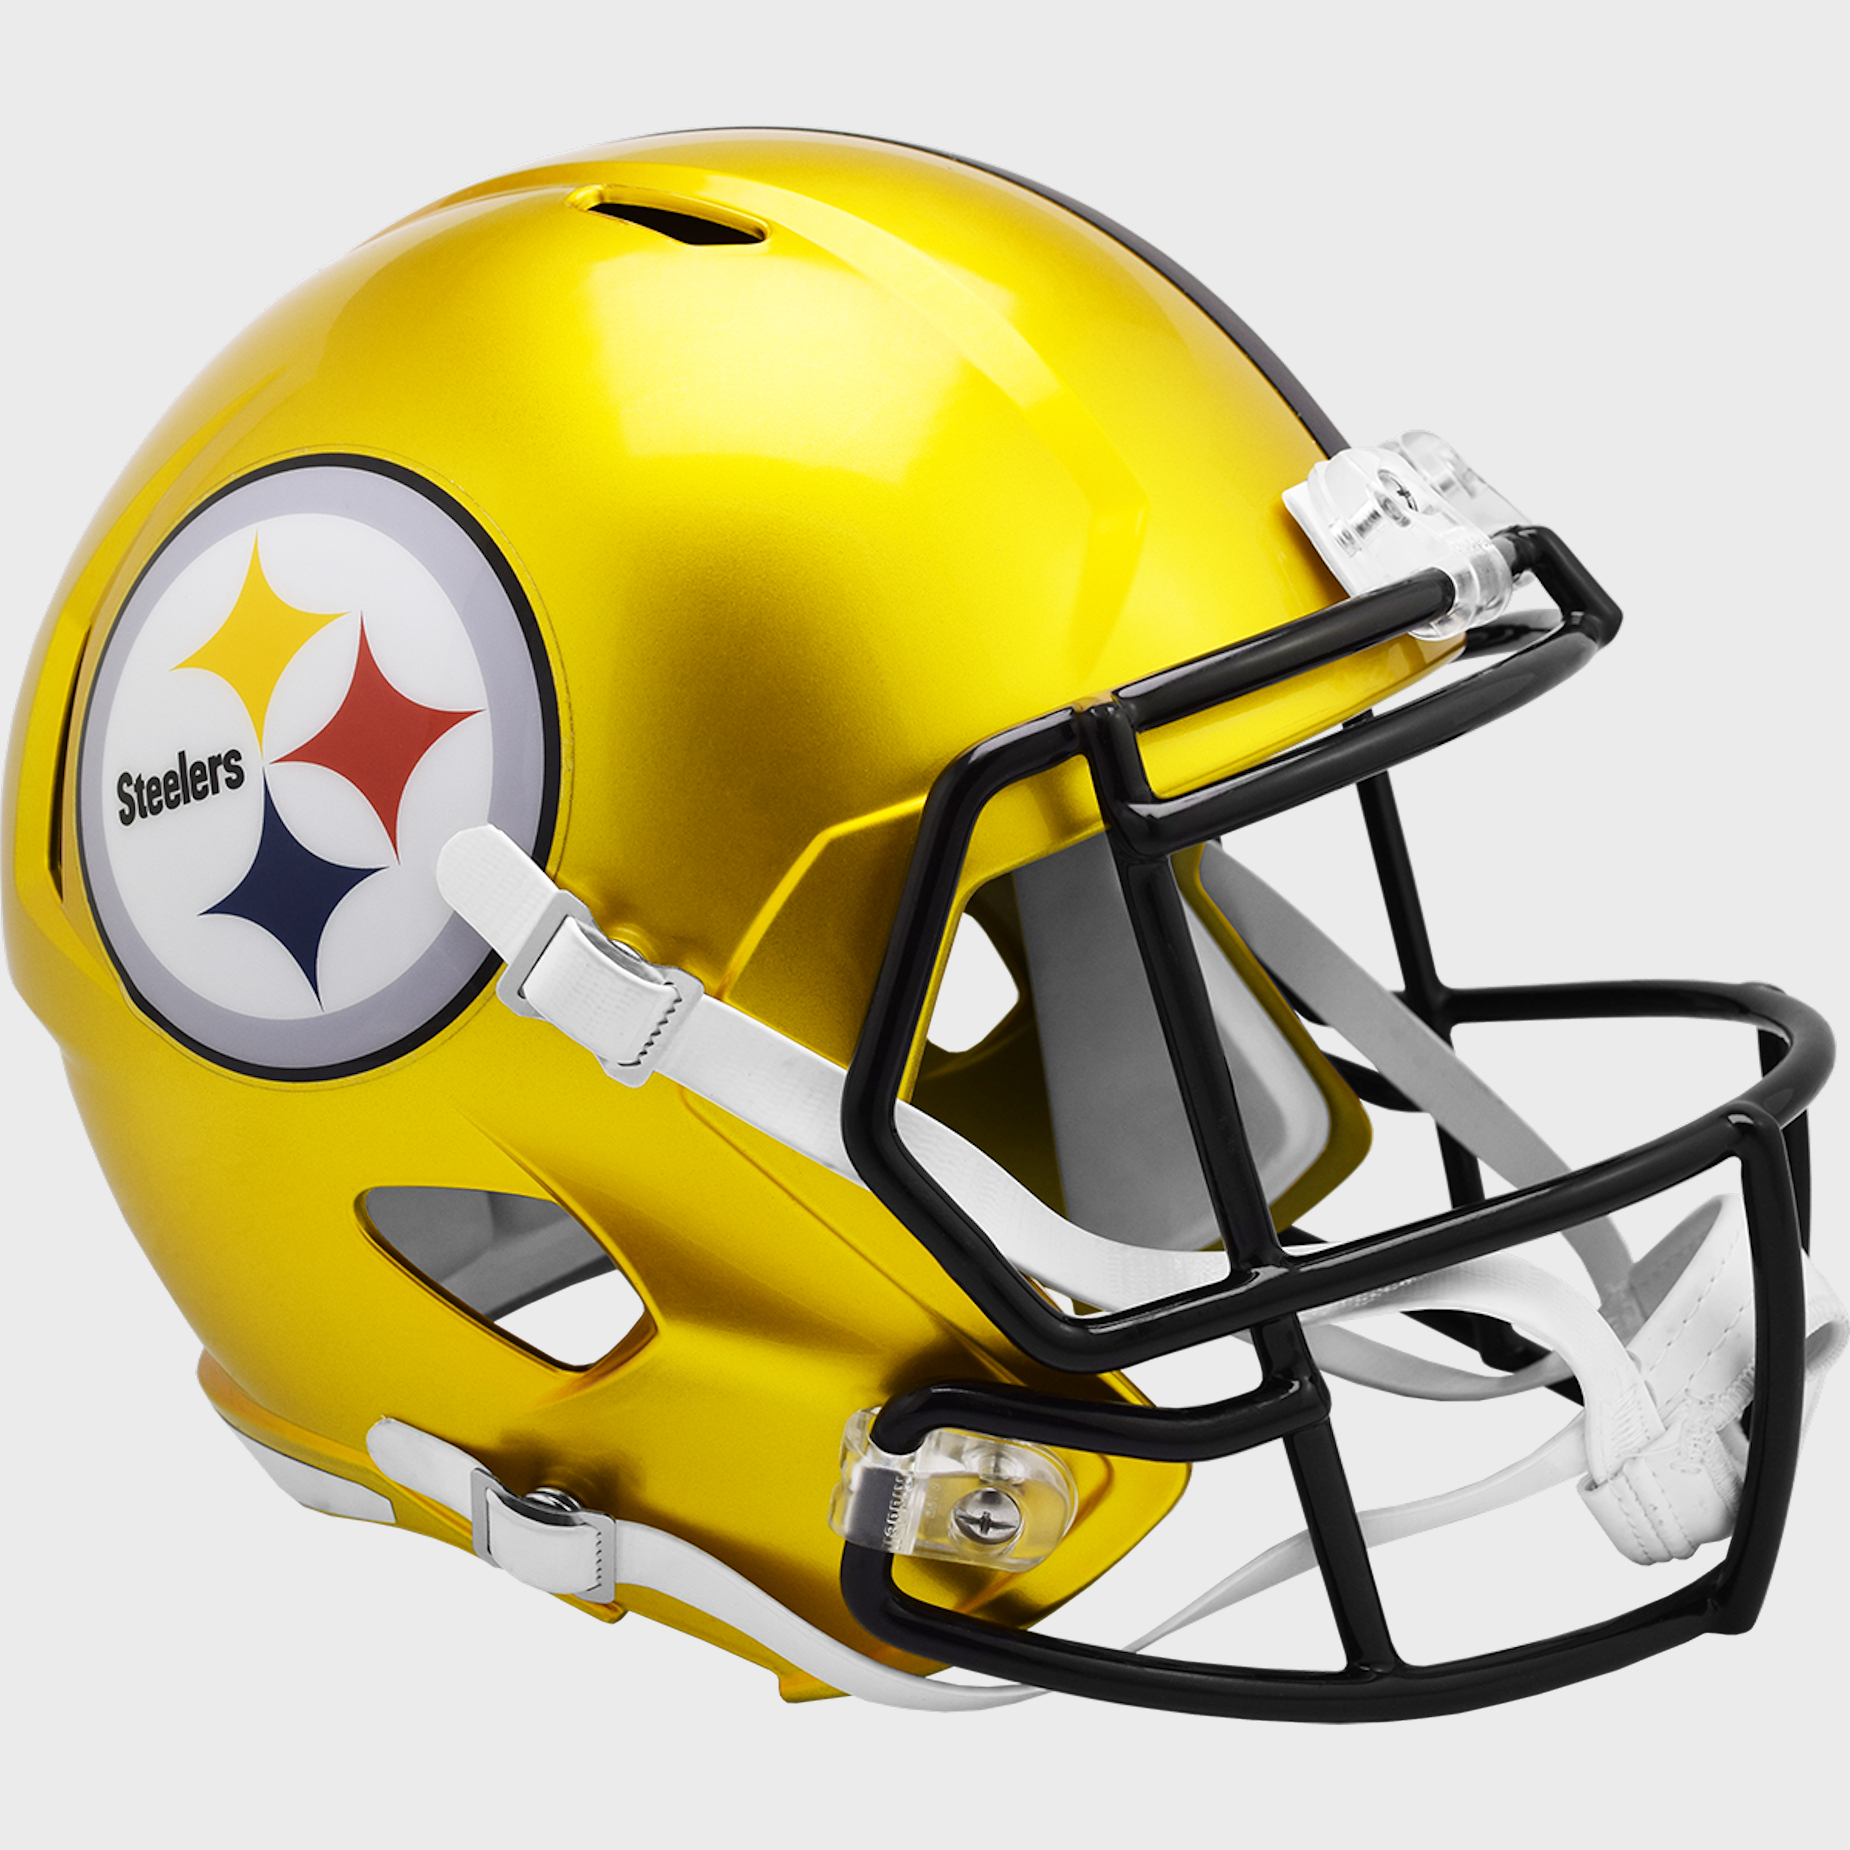 Pittsburgh Steelers Speed Replica Football Helmet <B>FLASH ESD 8/21/21</B>